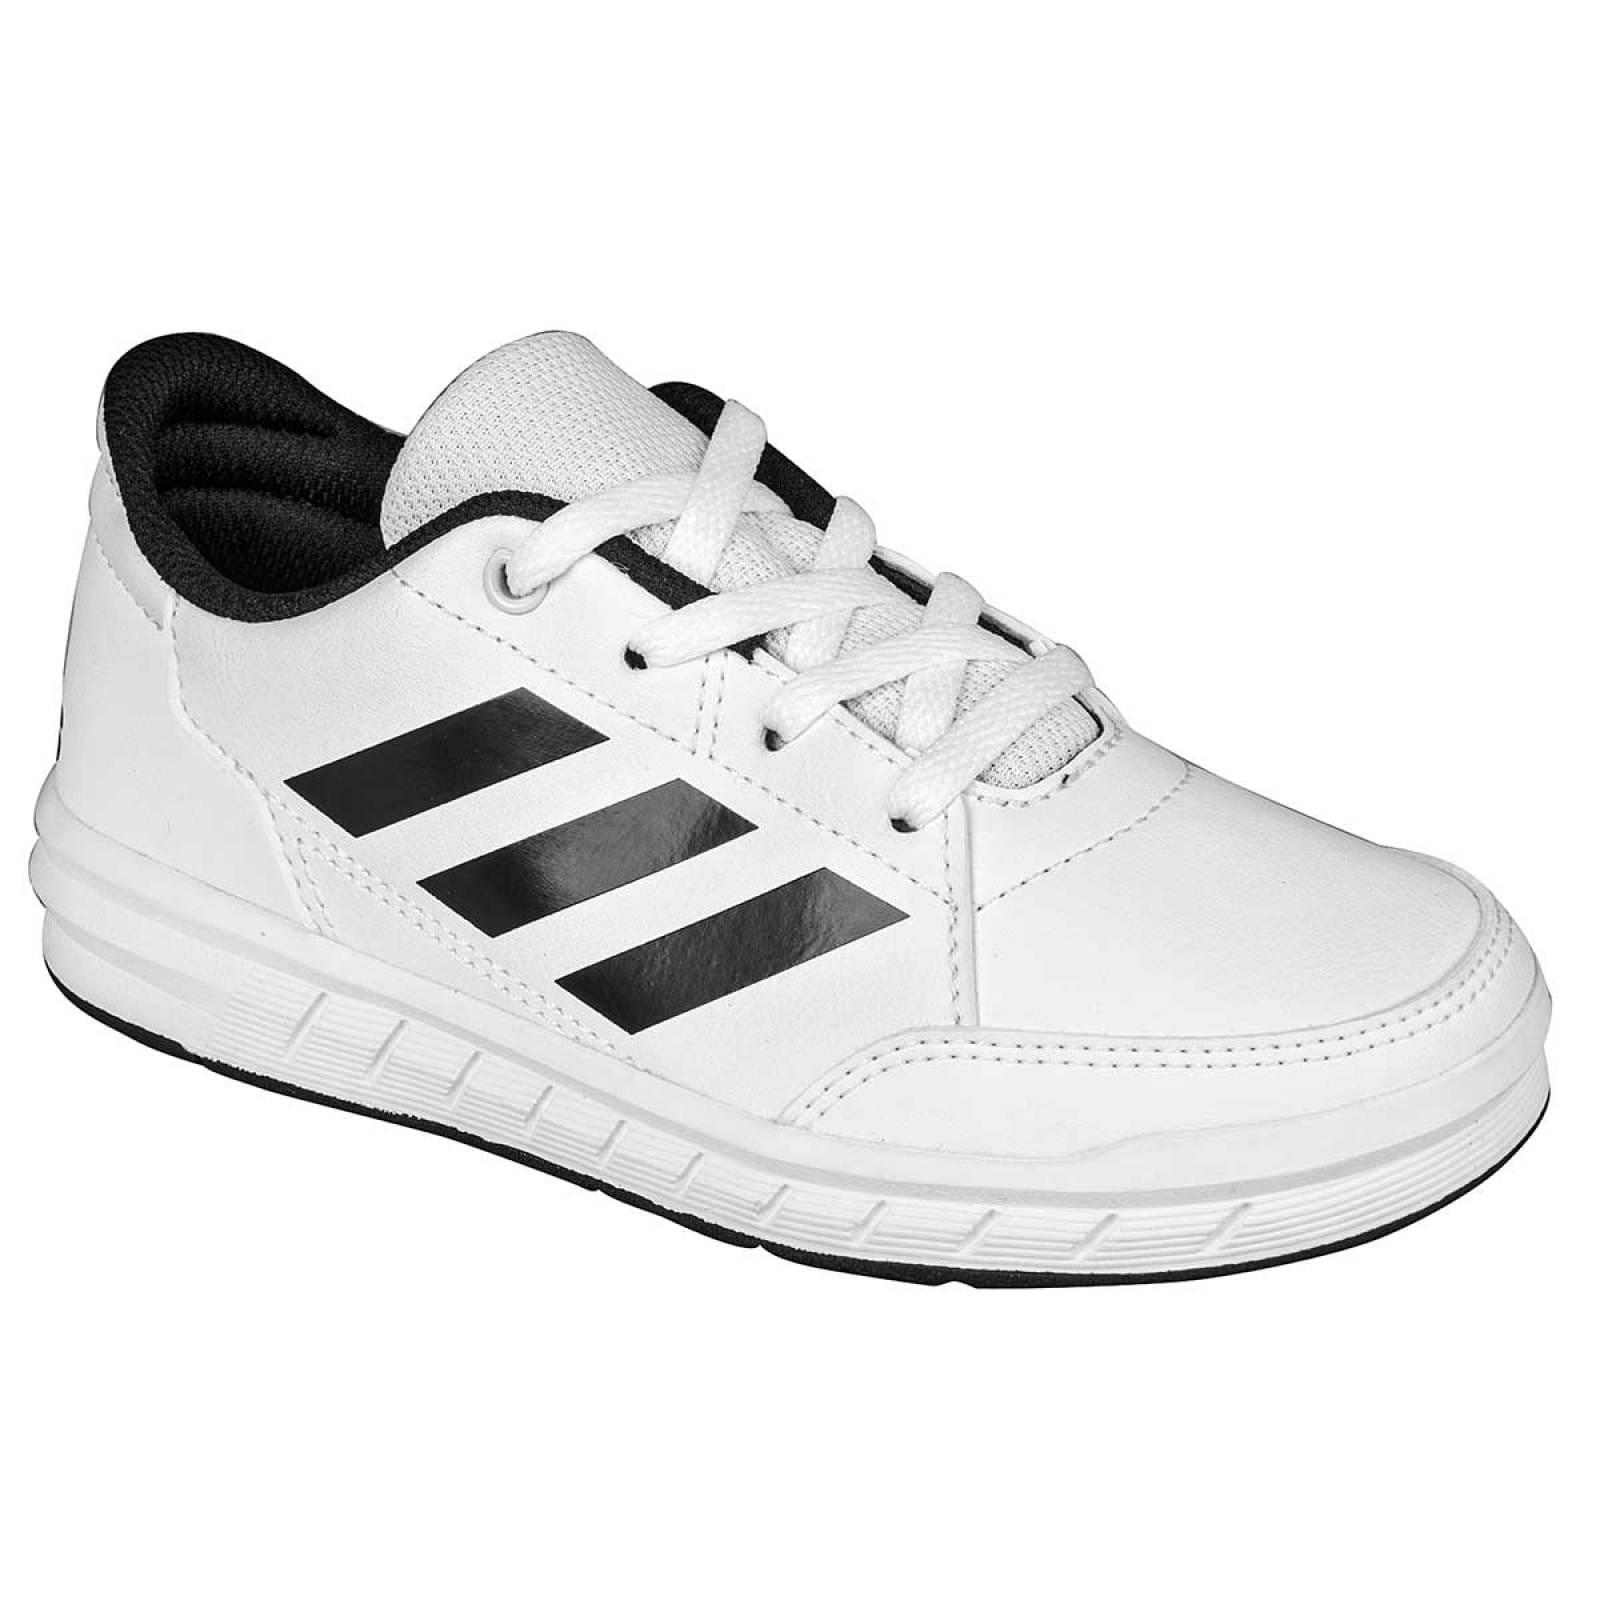 Adidas Tenis Joven Blanco negro altasport k